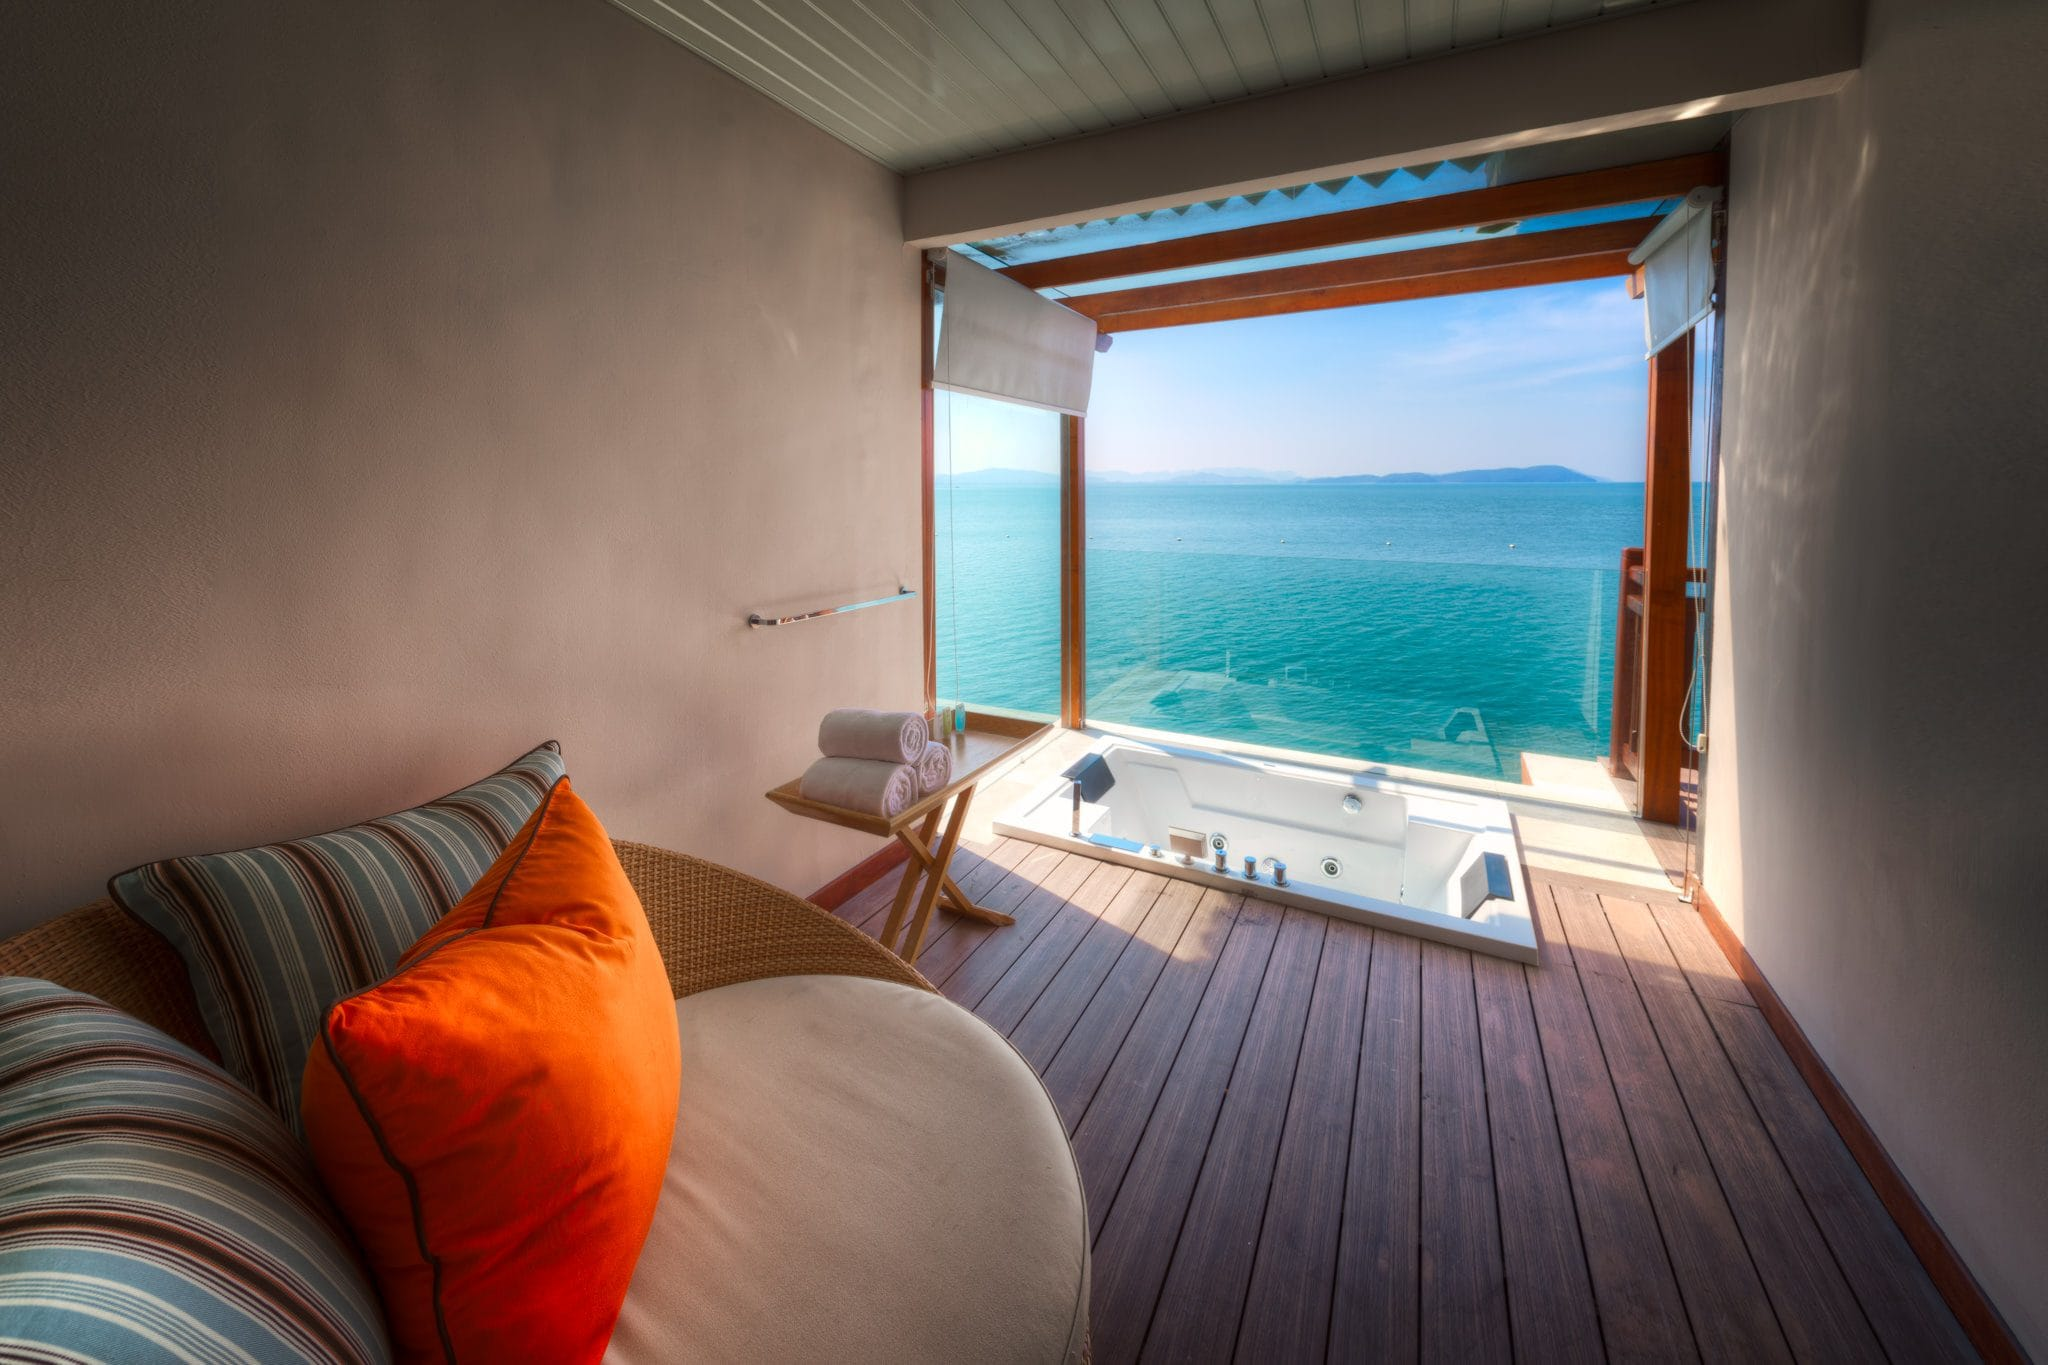 Berjaya Resort on Langkawi, Malaysia – Bathroom with a view.